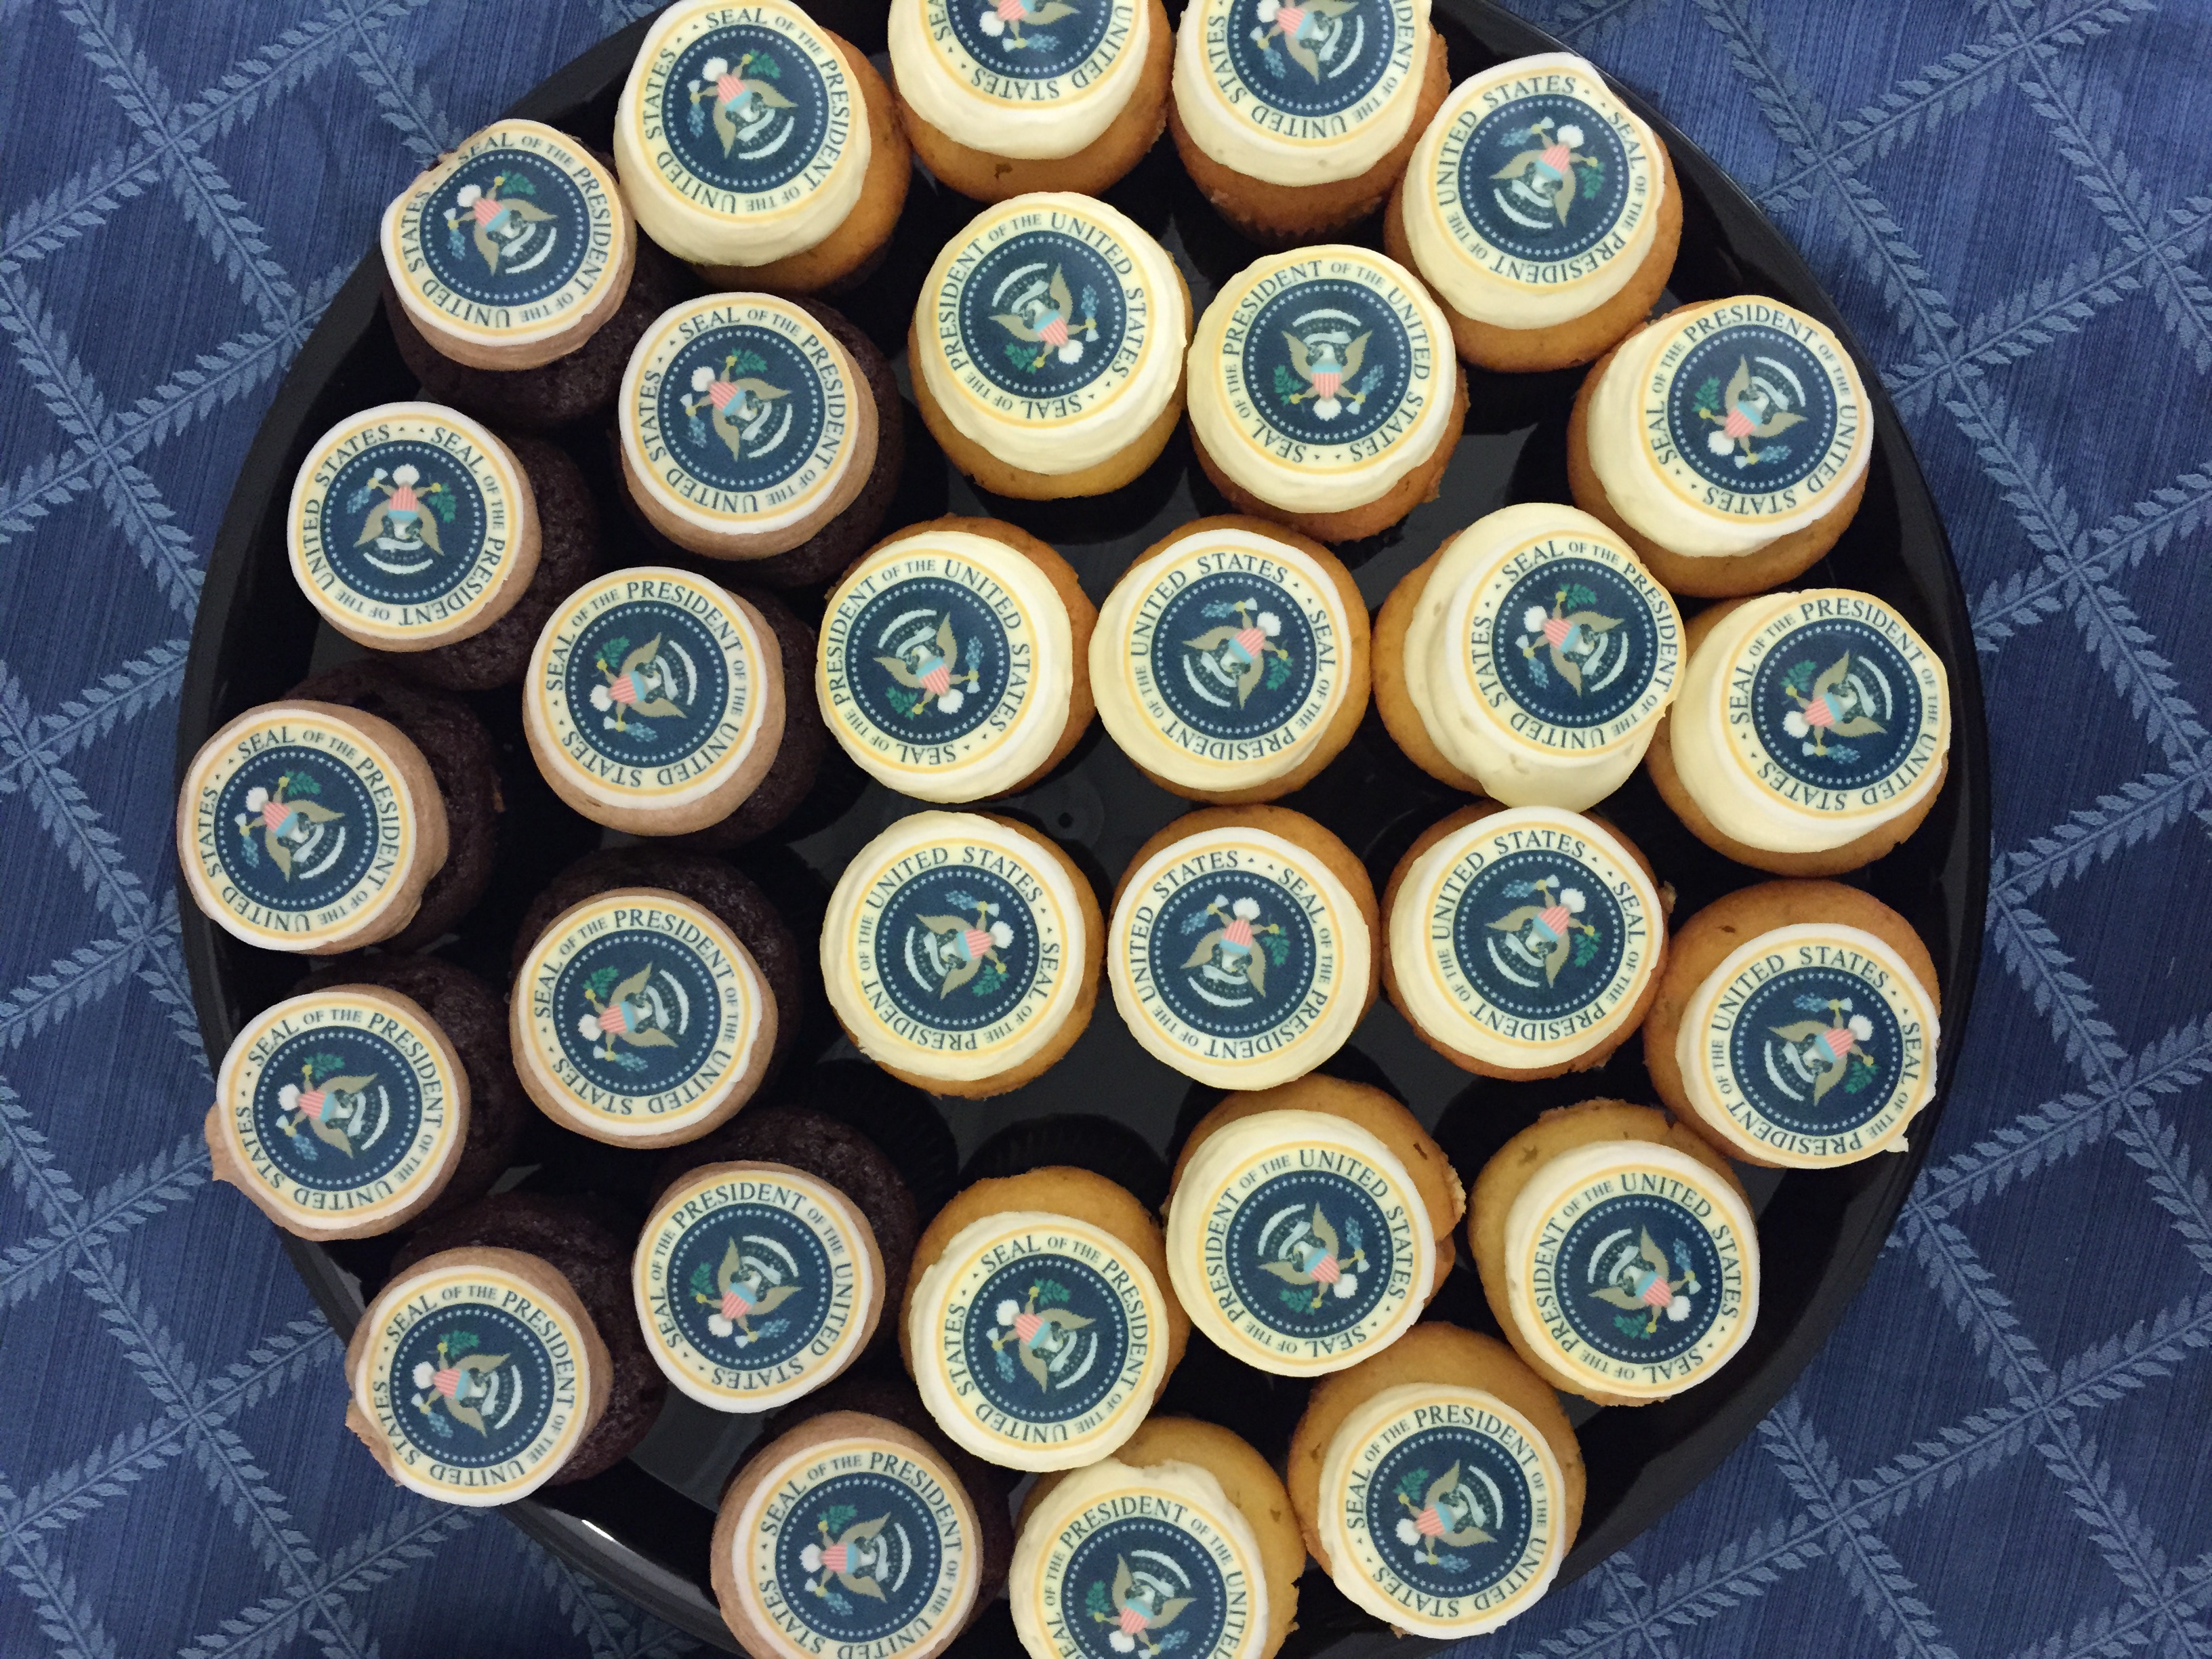 POTUS cupcakes